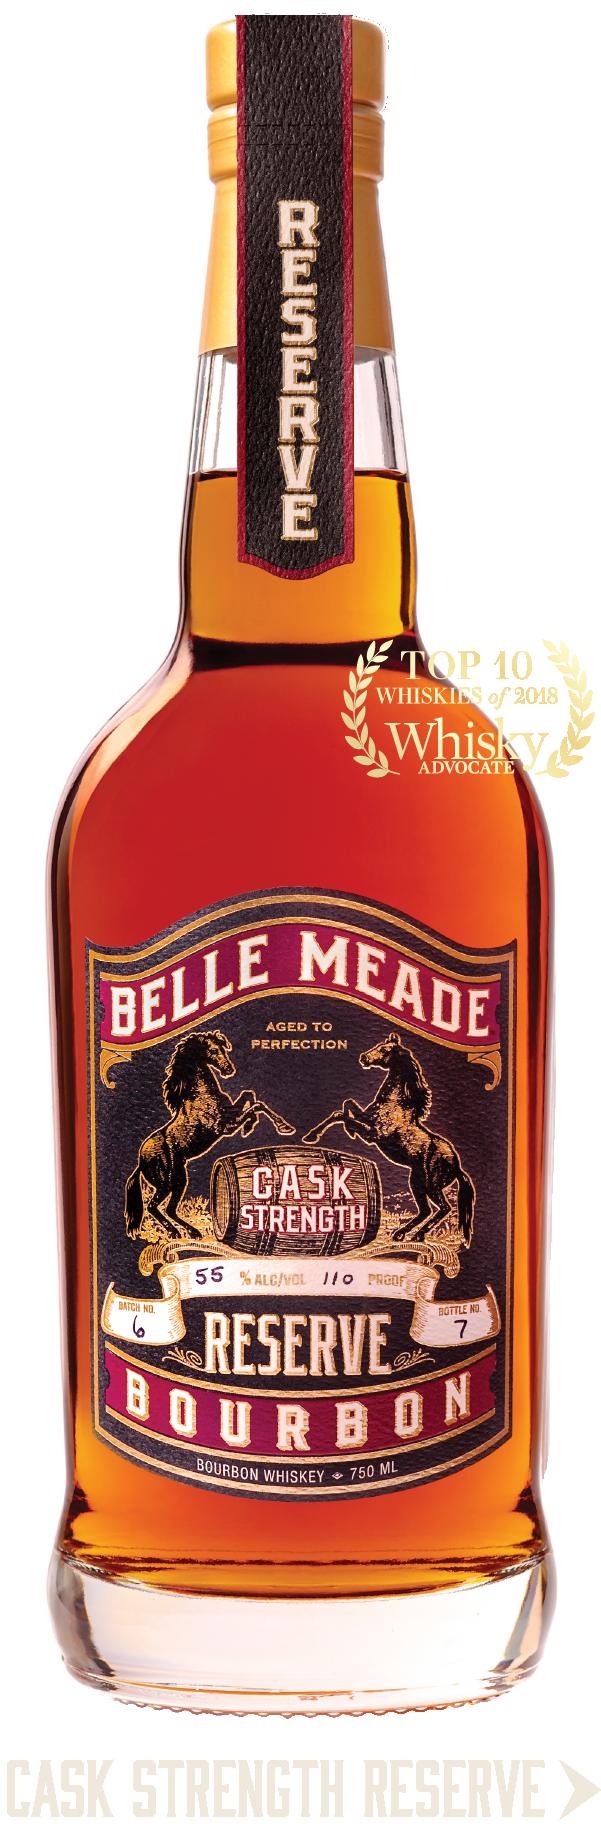 Belle Meade Bourbon_Cask Strength Reserve.png